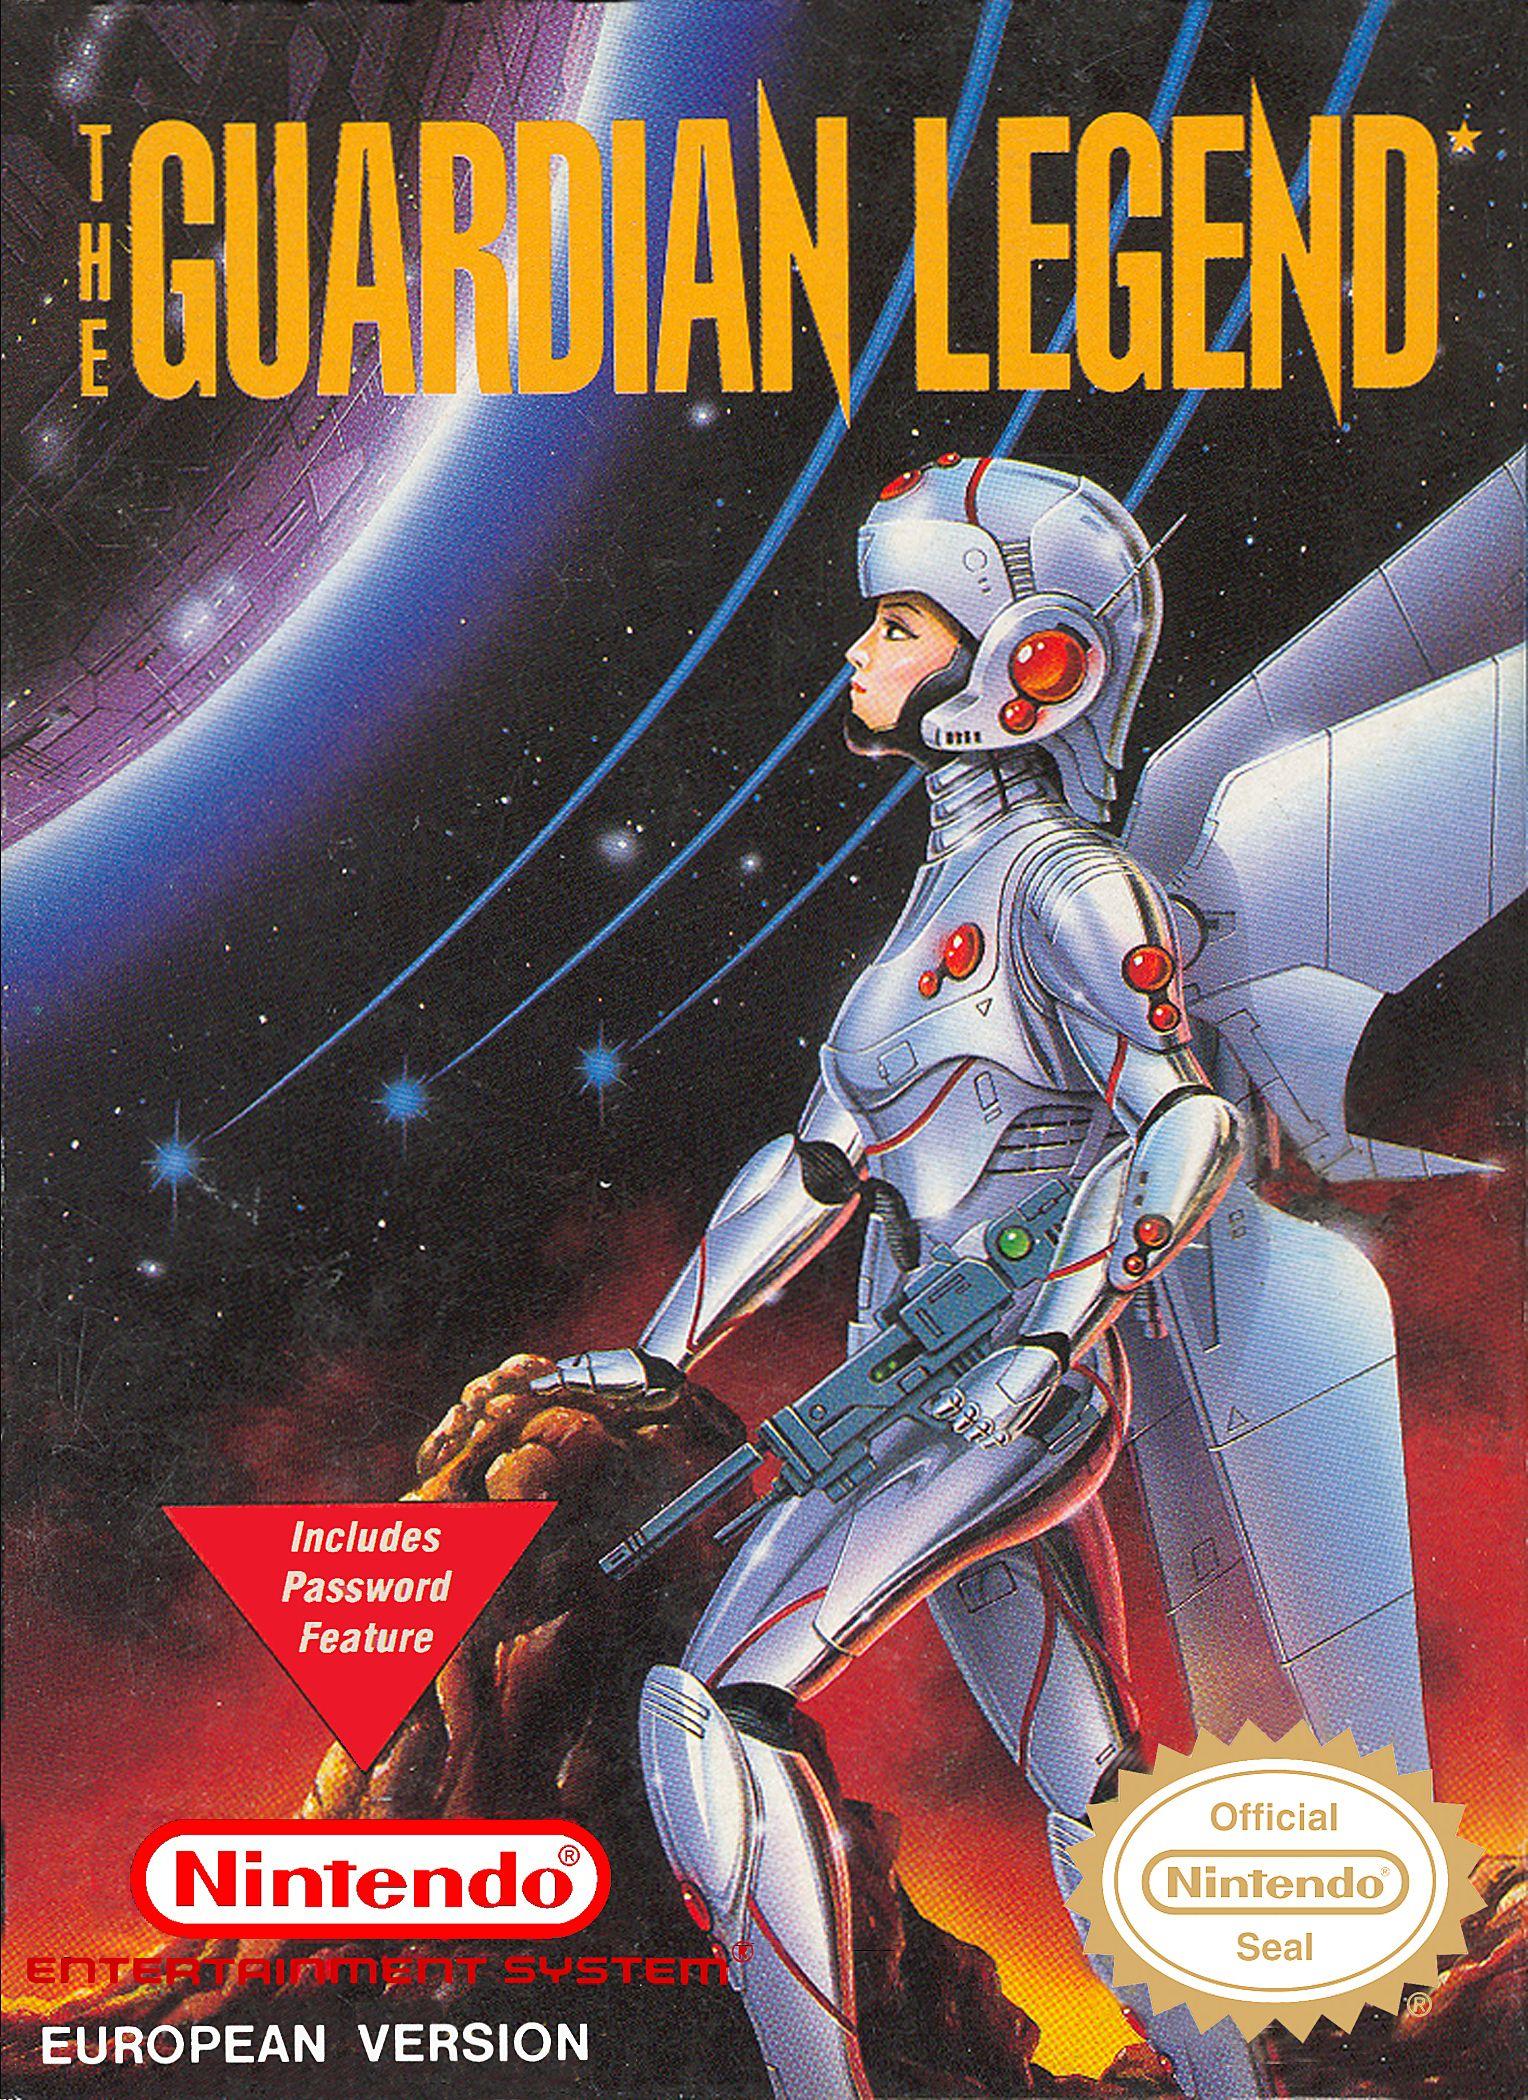 Guardian Legend Nes Game Illustration Retro Video Games